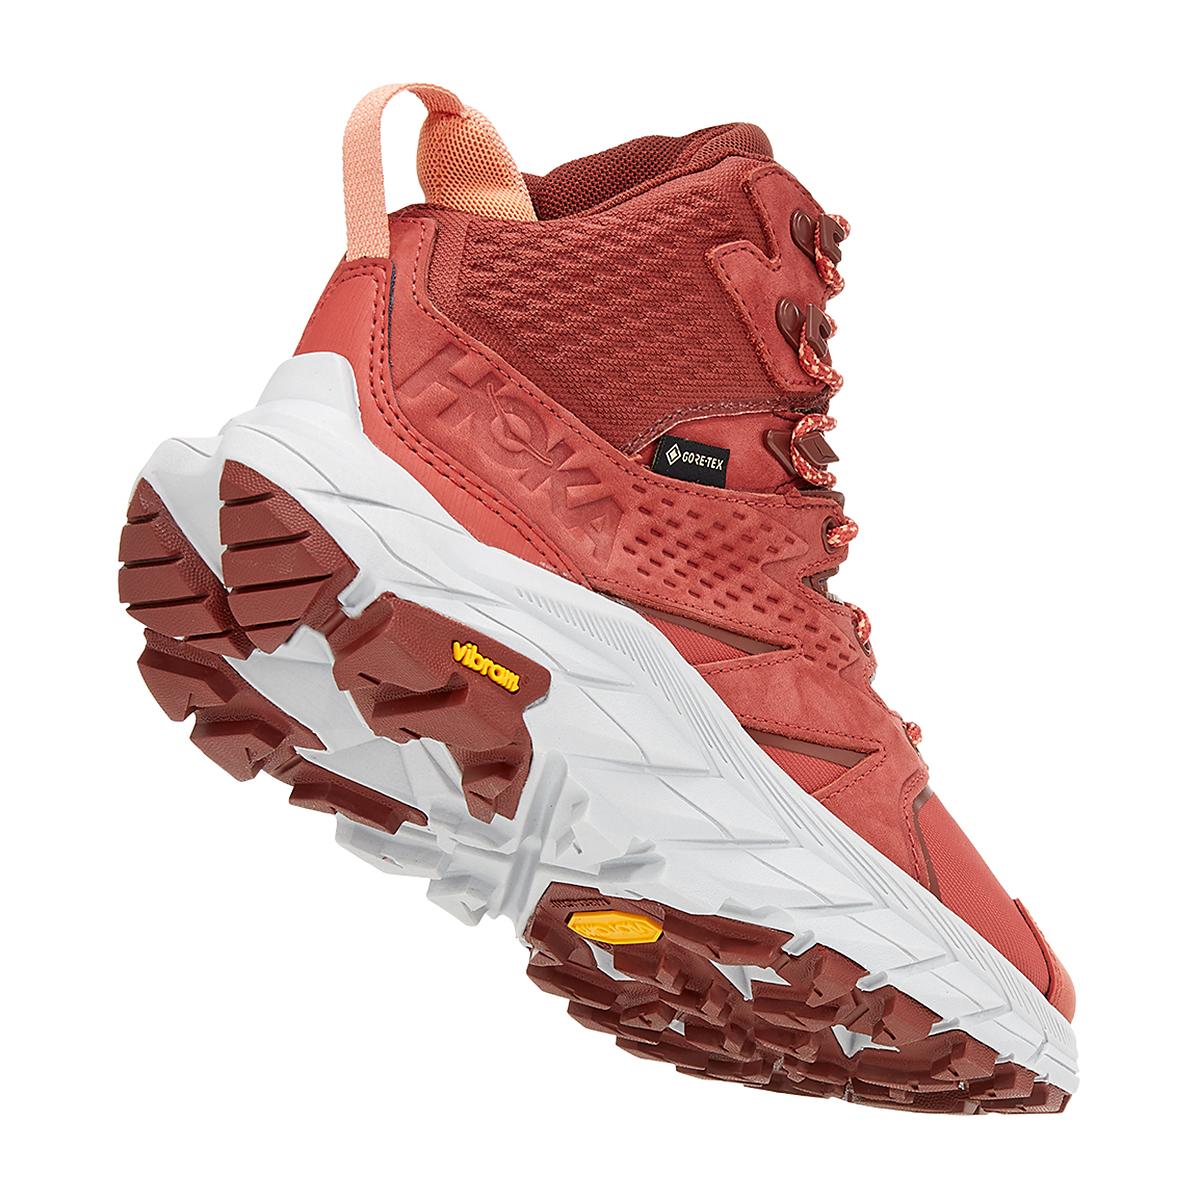 Women's Hoka One One Anacapa Mid Gore-Tex Trail Running Shoe - Color: Hot Sauce/Cherry Mahogany - Size: 5 - Width: Regular, Hot Sauce/Cherry Mahogany, large, image 3